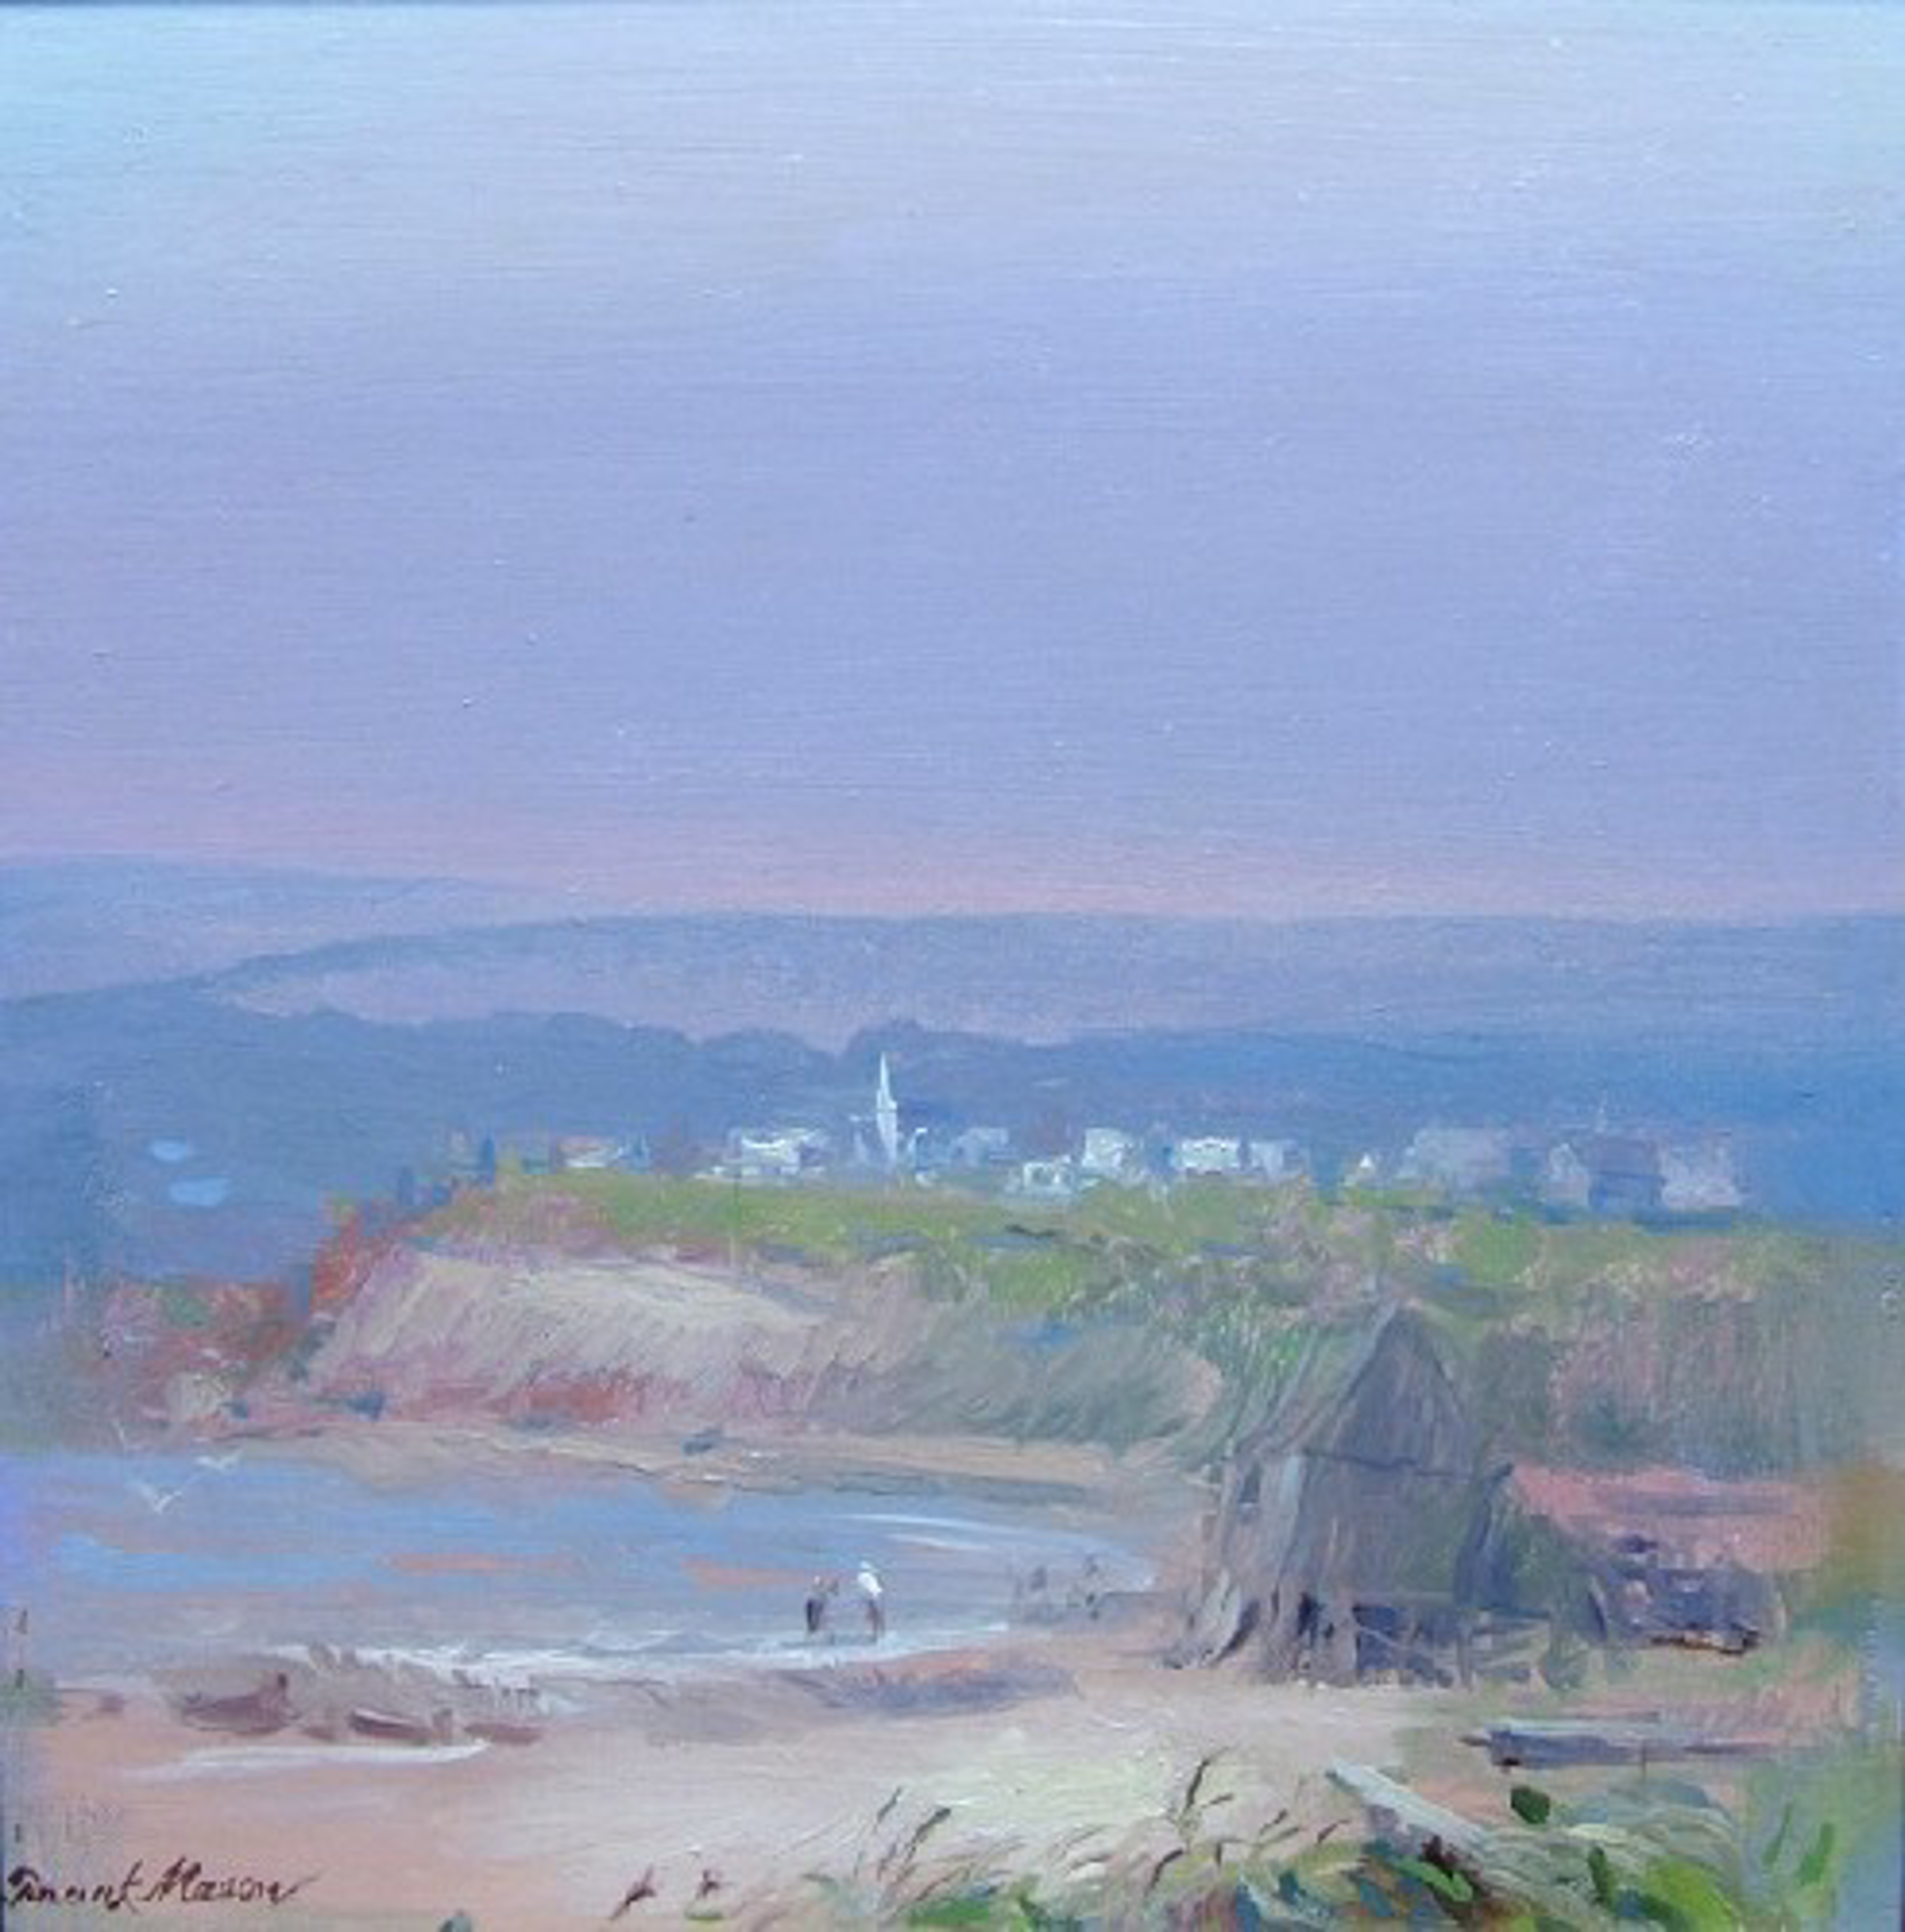 Ingonish, Nova Scotia by Frank Mason (1921 - 2009)